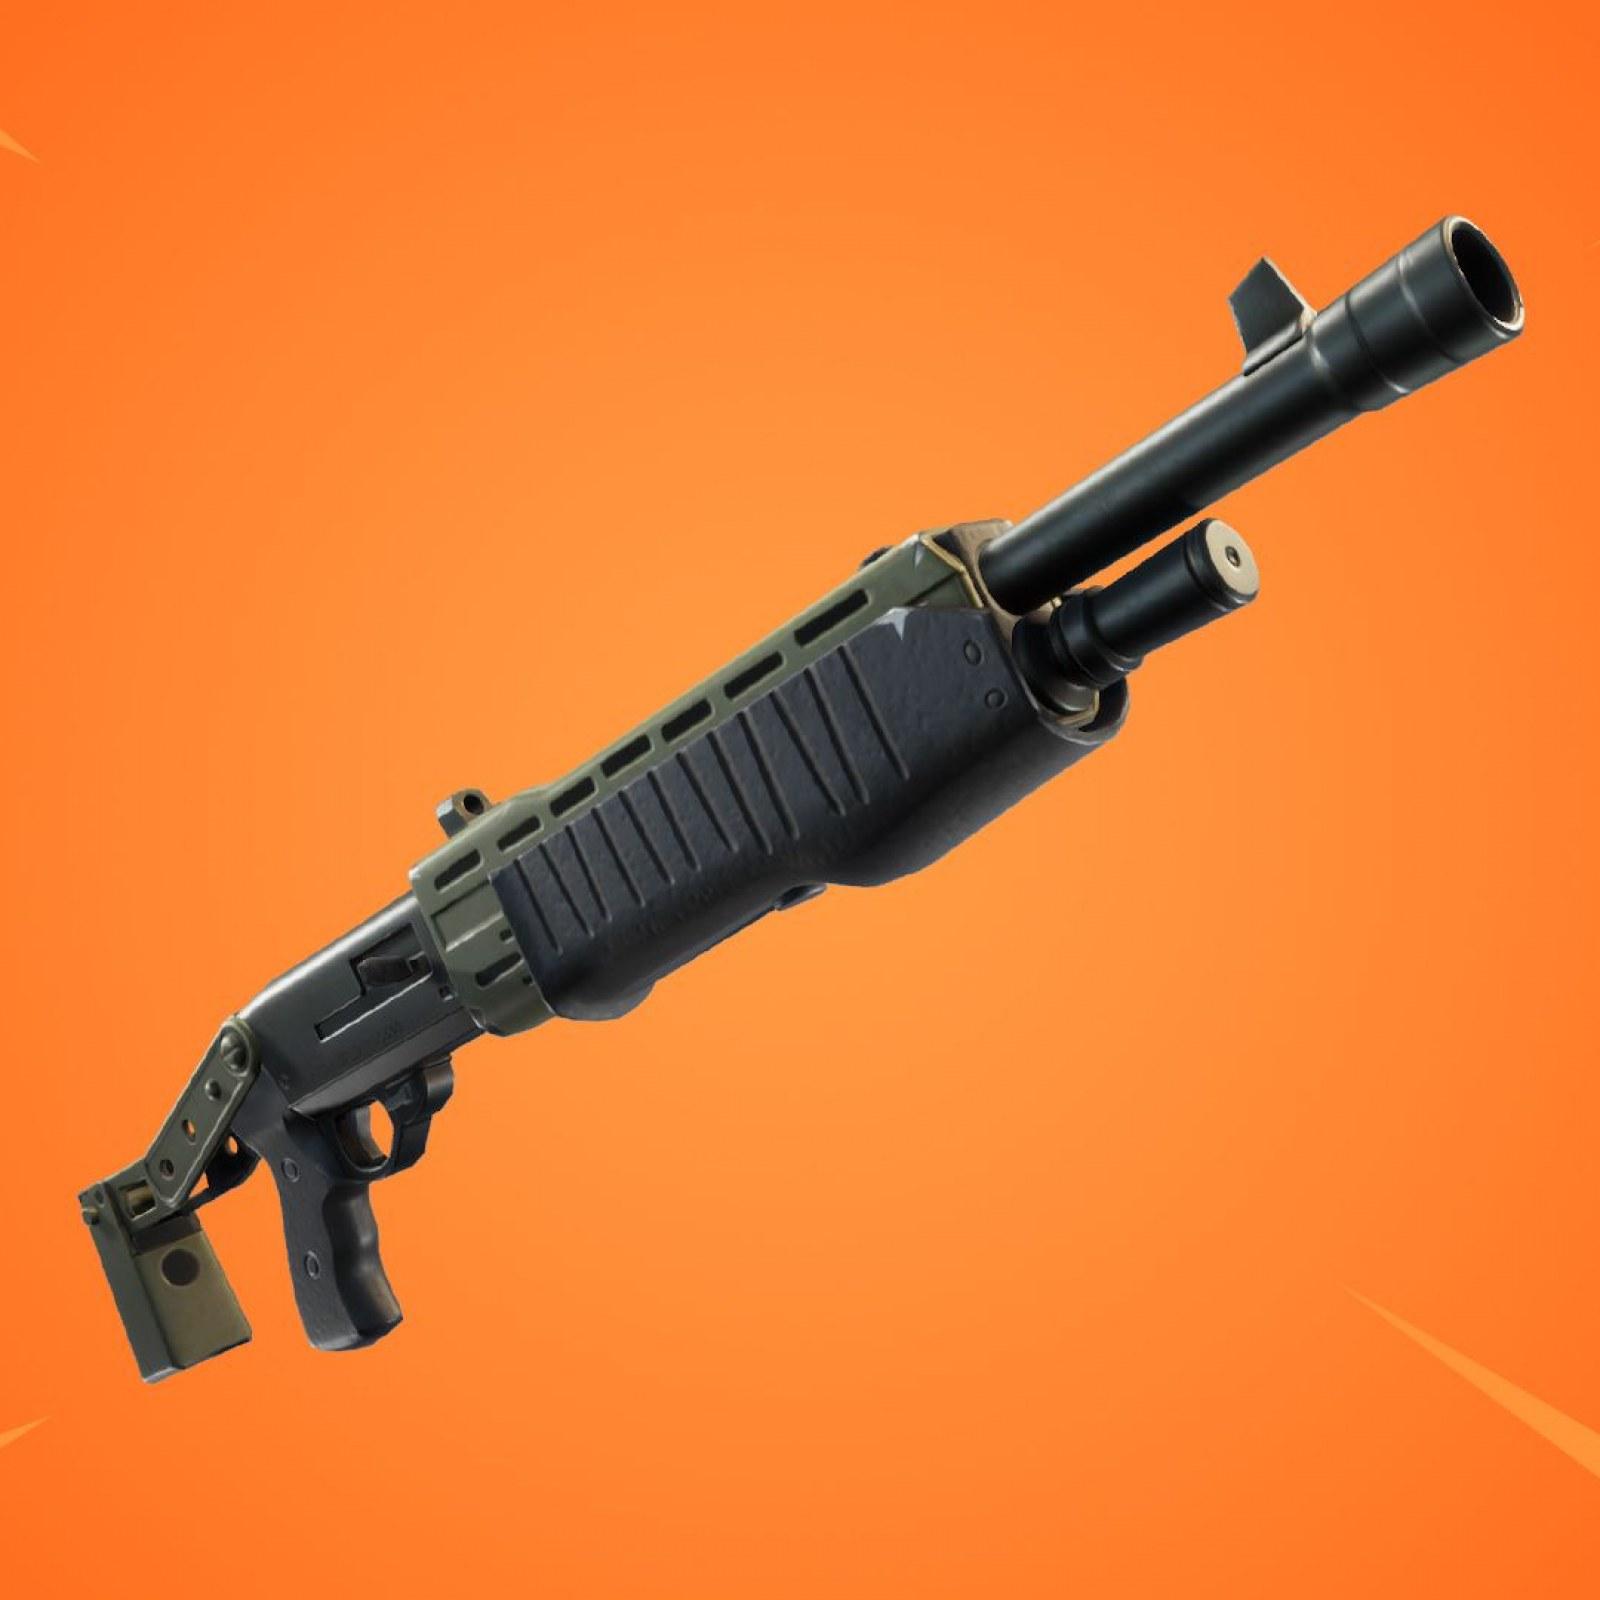 Fortnite' Update 6 31 Adds Legendary Pump Shotgun & Team